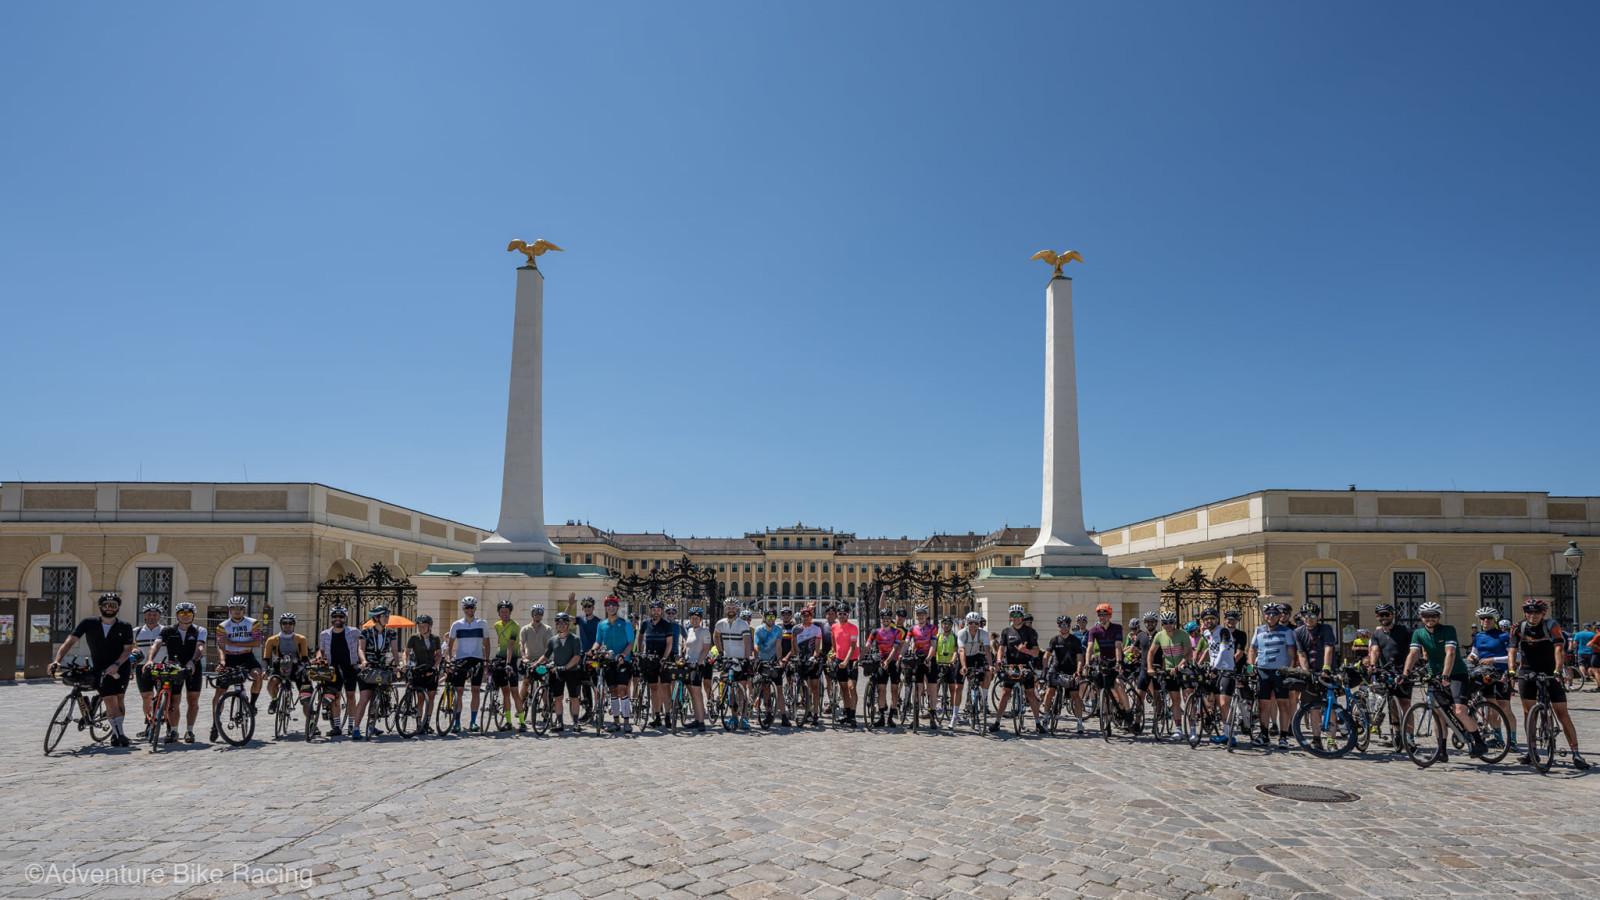 Bikes of Three Peaks Bike Race 2020